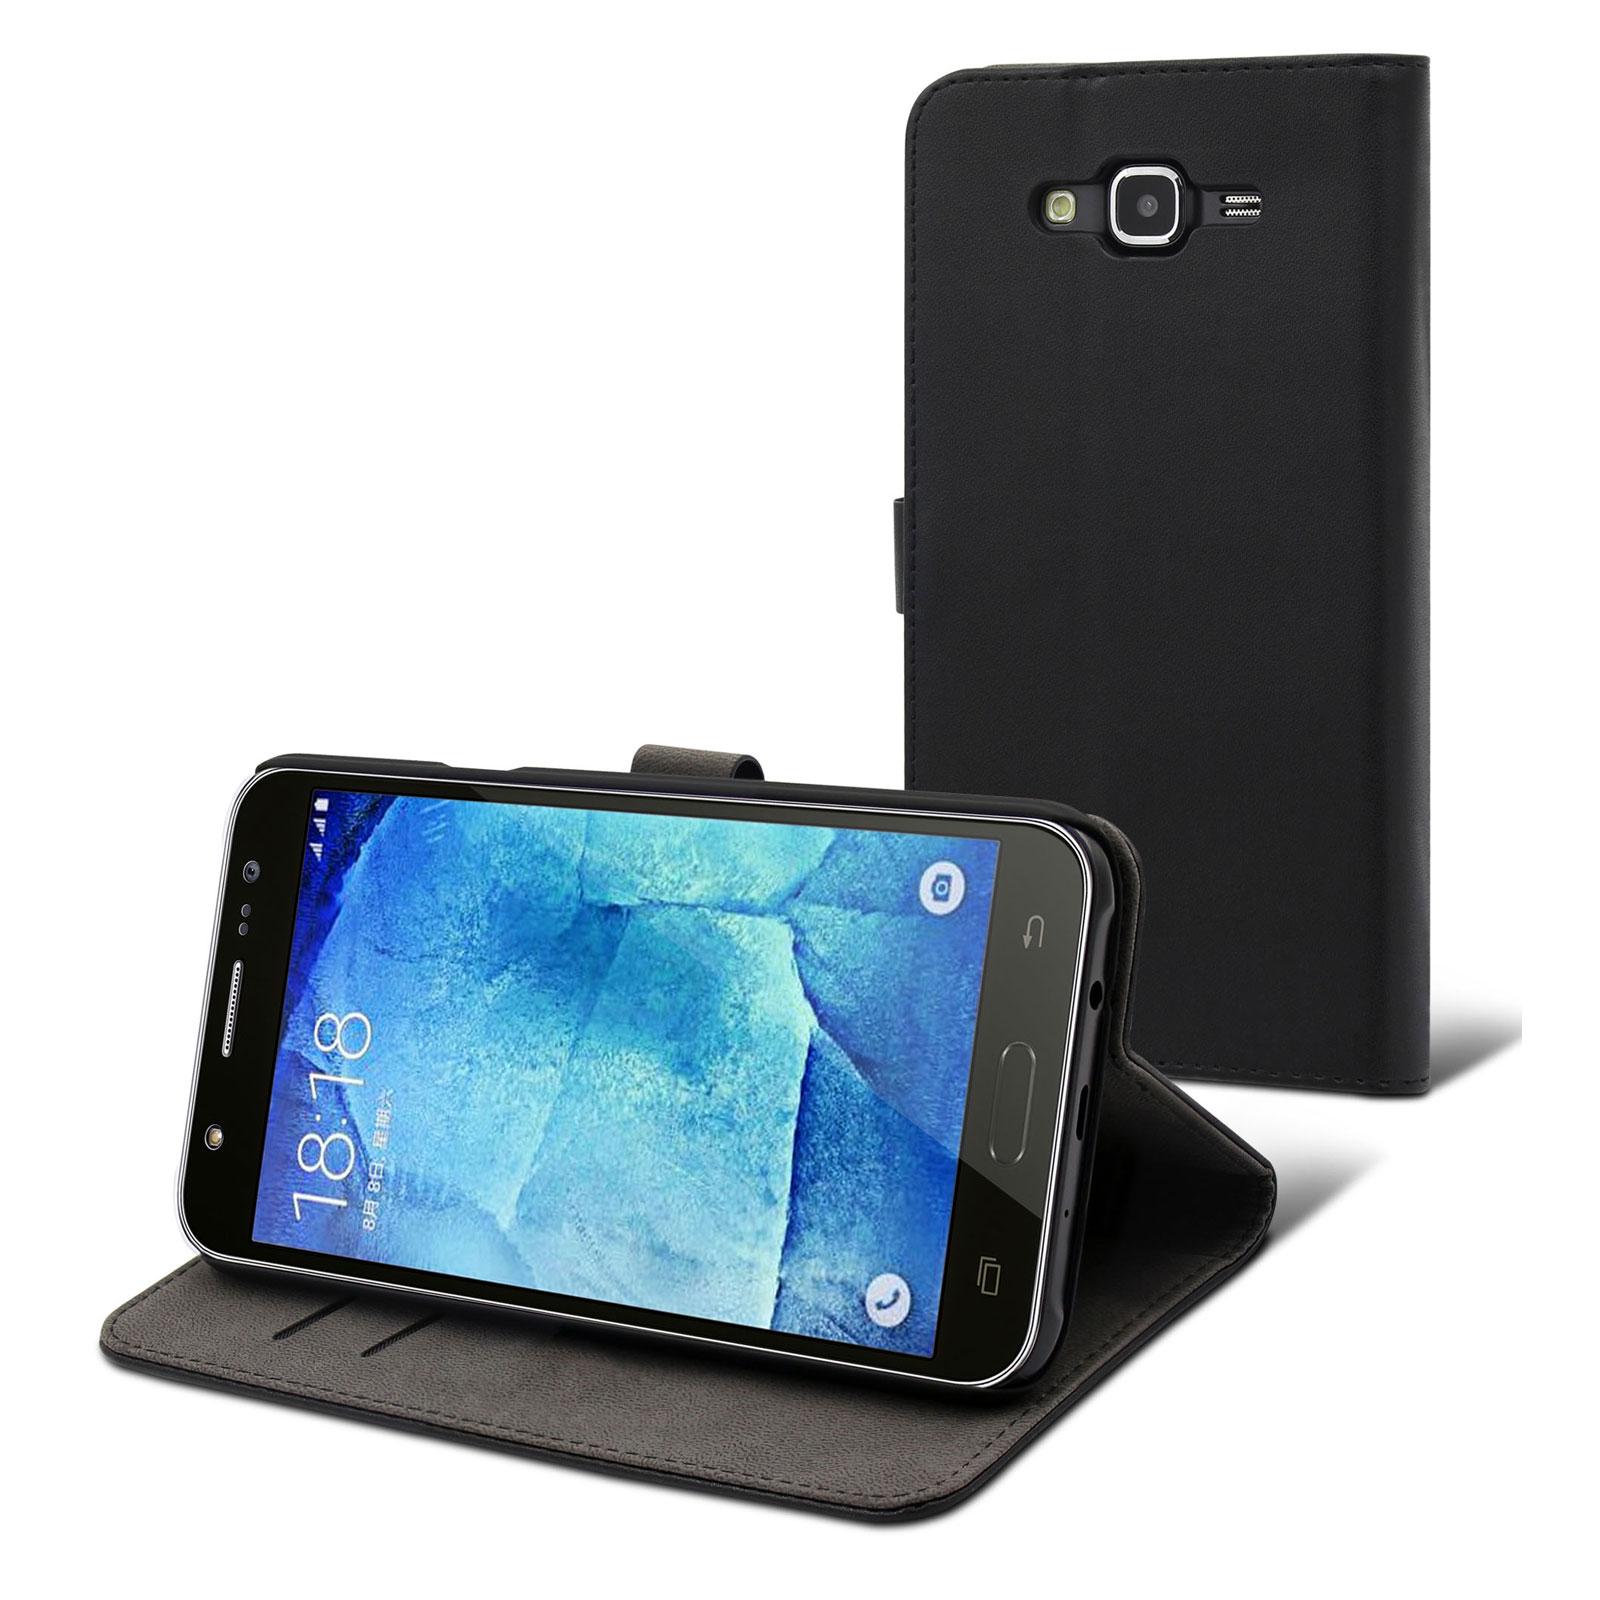 Muvit Etui Slim S Folio Noir Samsung Galaxy J7 Etui